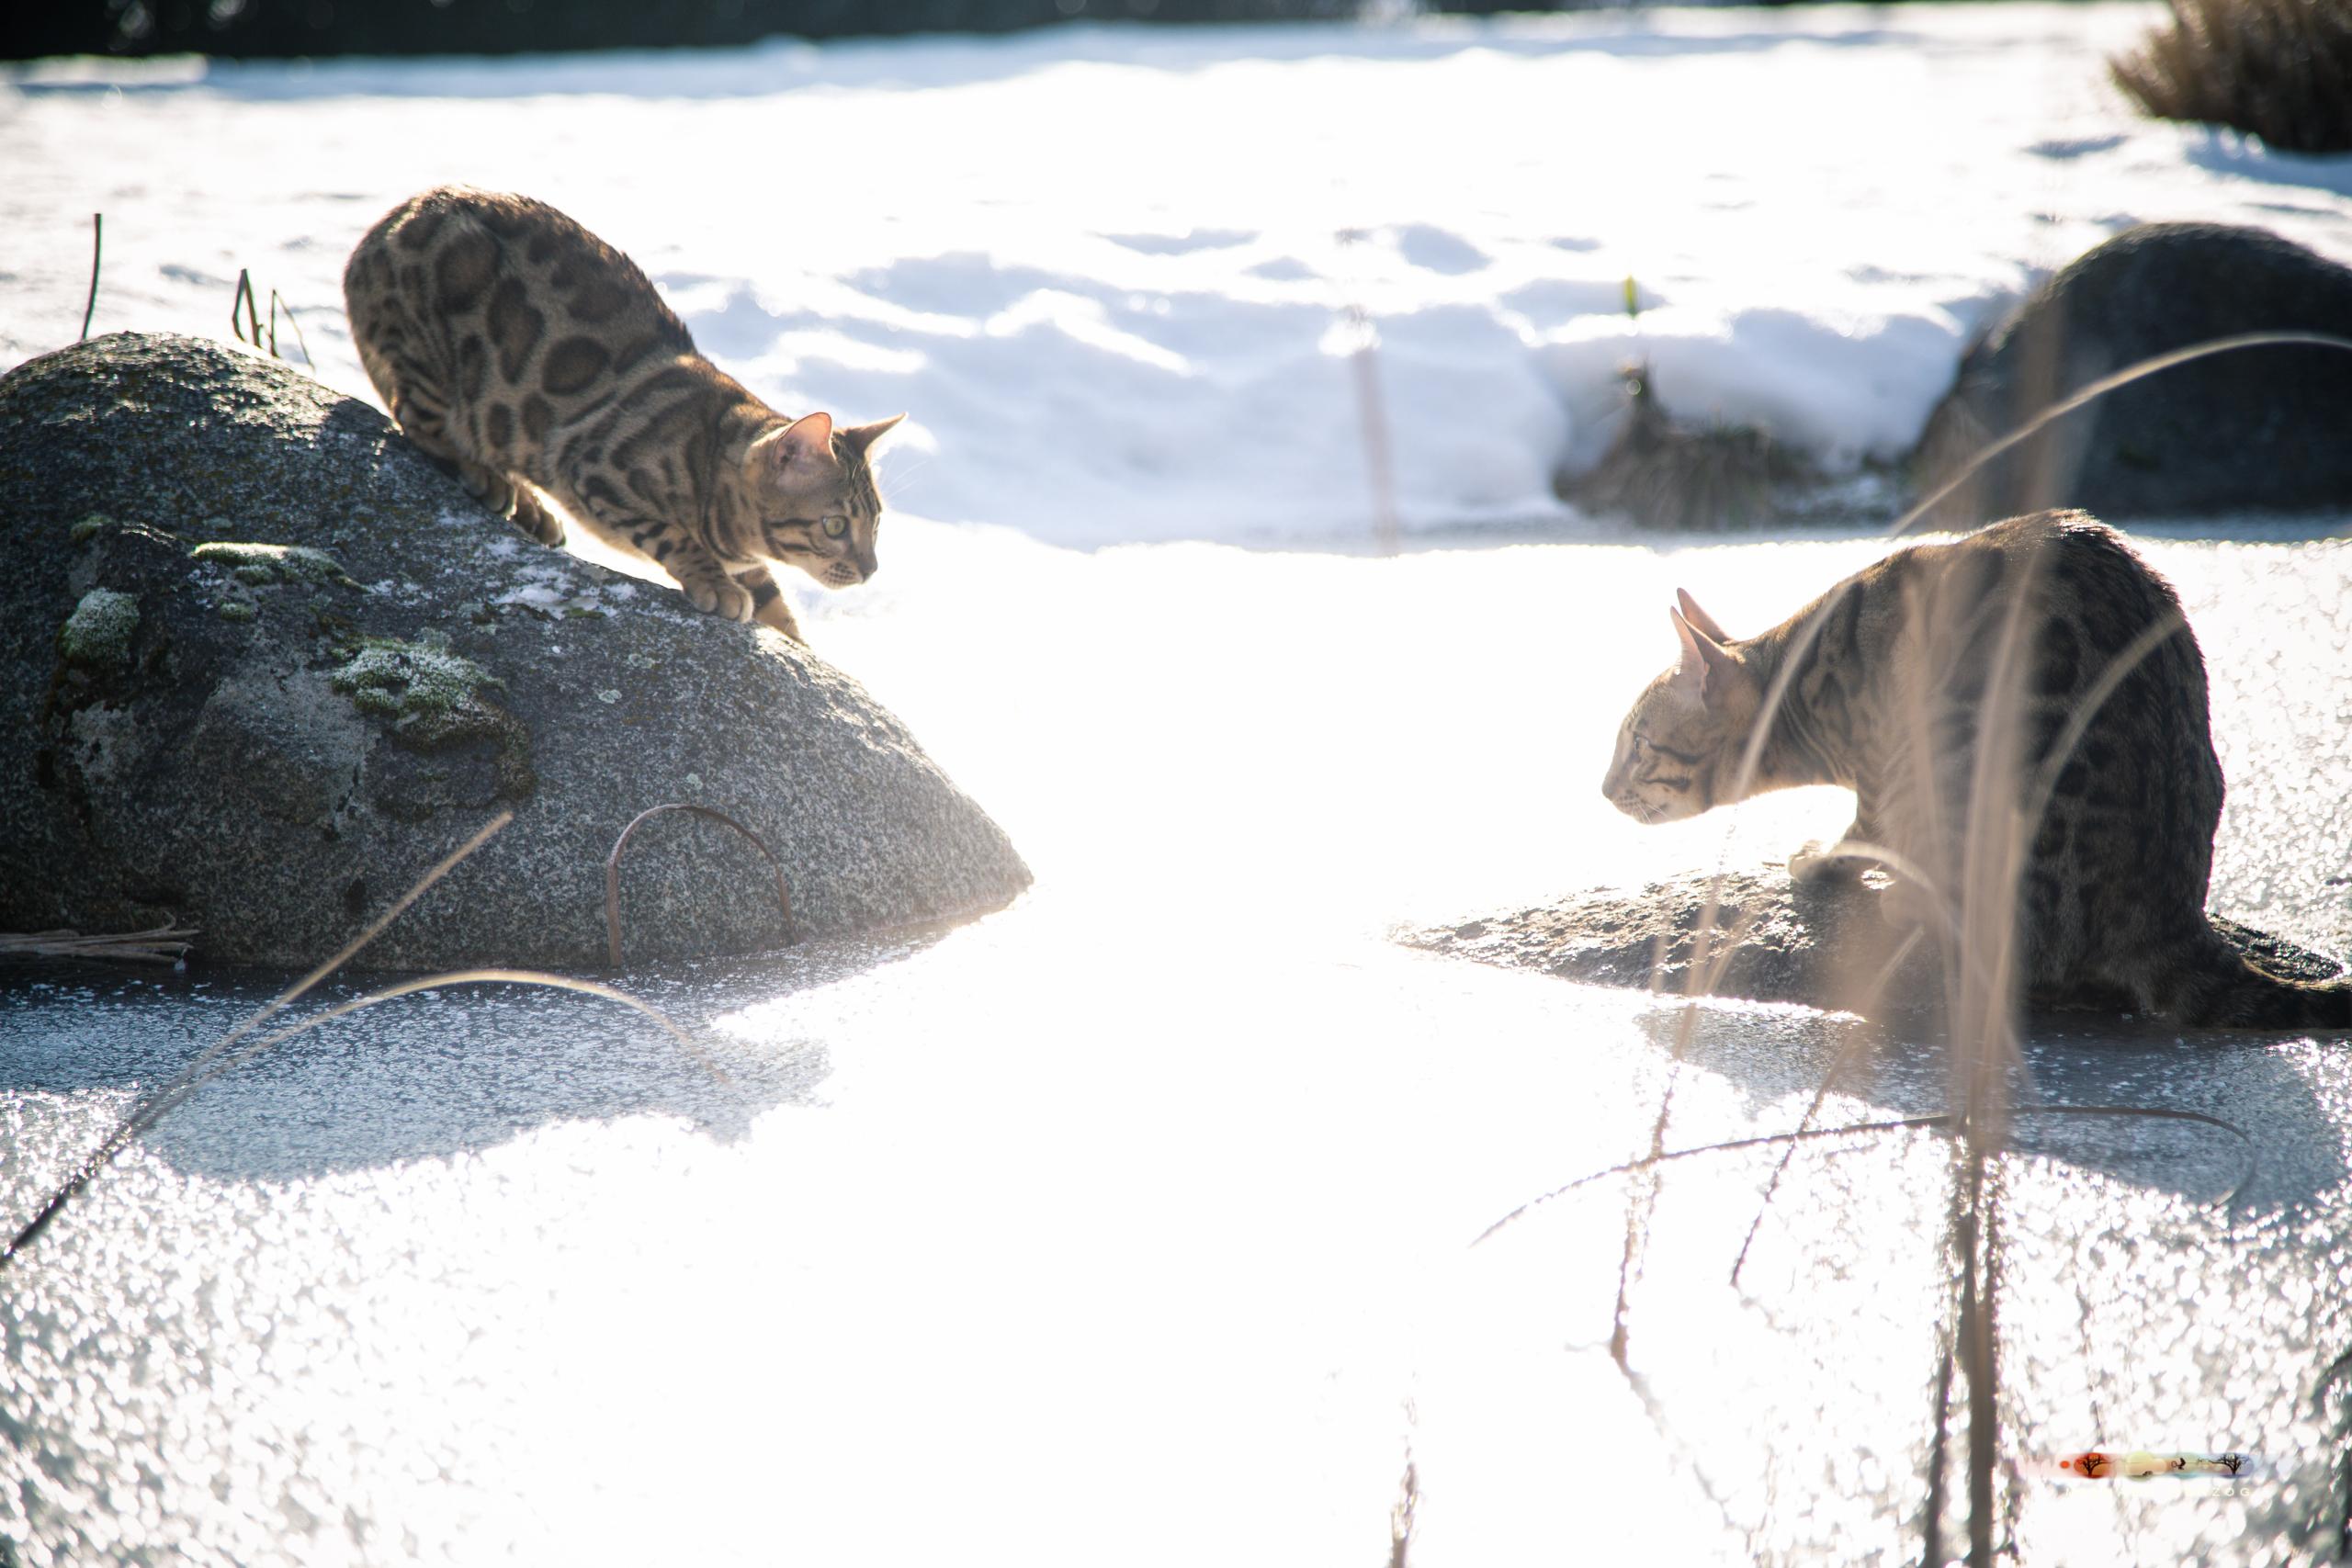 BALUARI_Winter2019_Garten_MichaelHerzog-8996.jpg